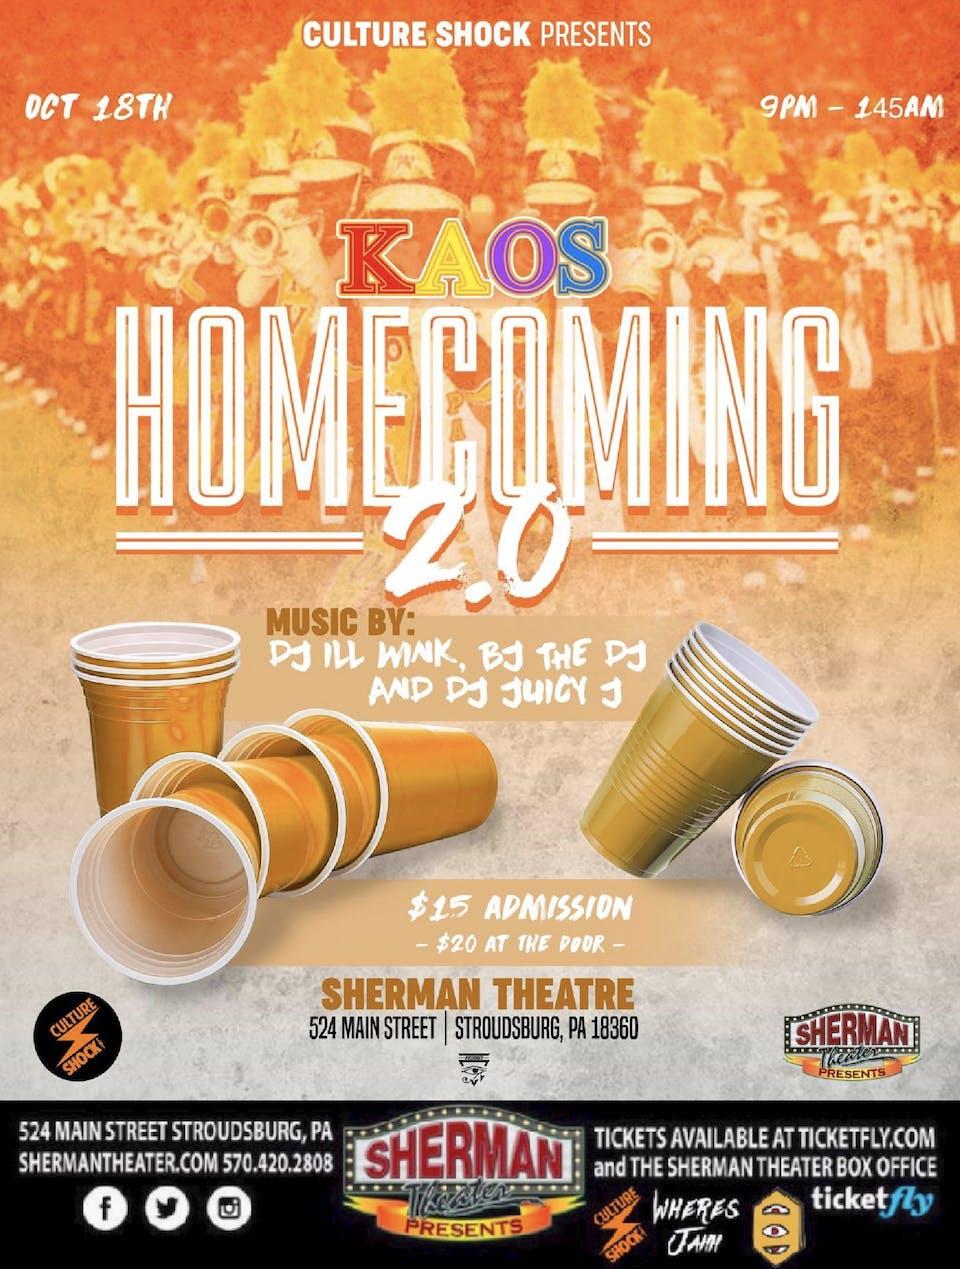 Kaos Homecoming 2019